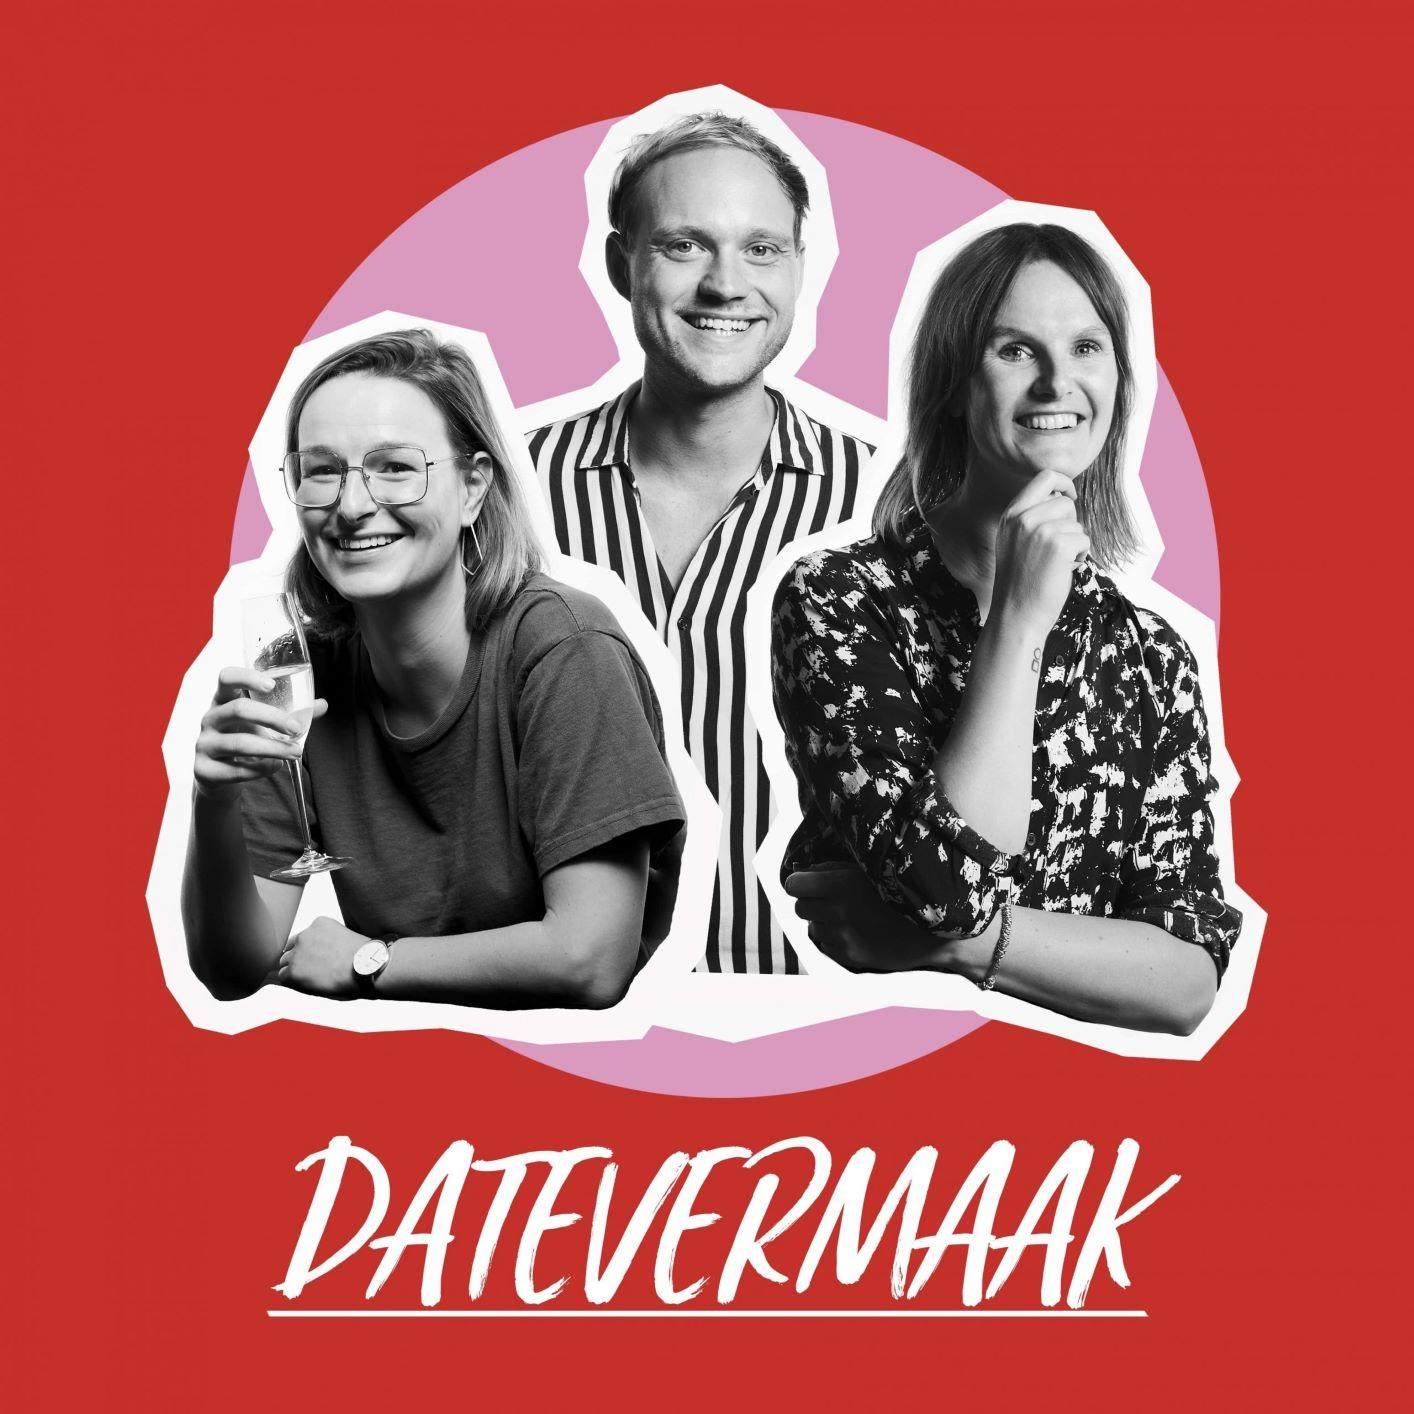 Datevermaak Podcast